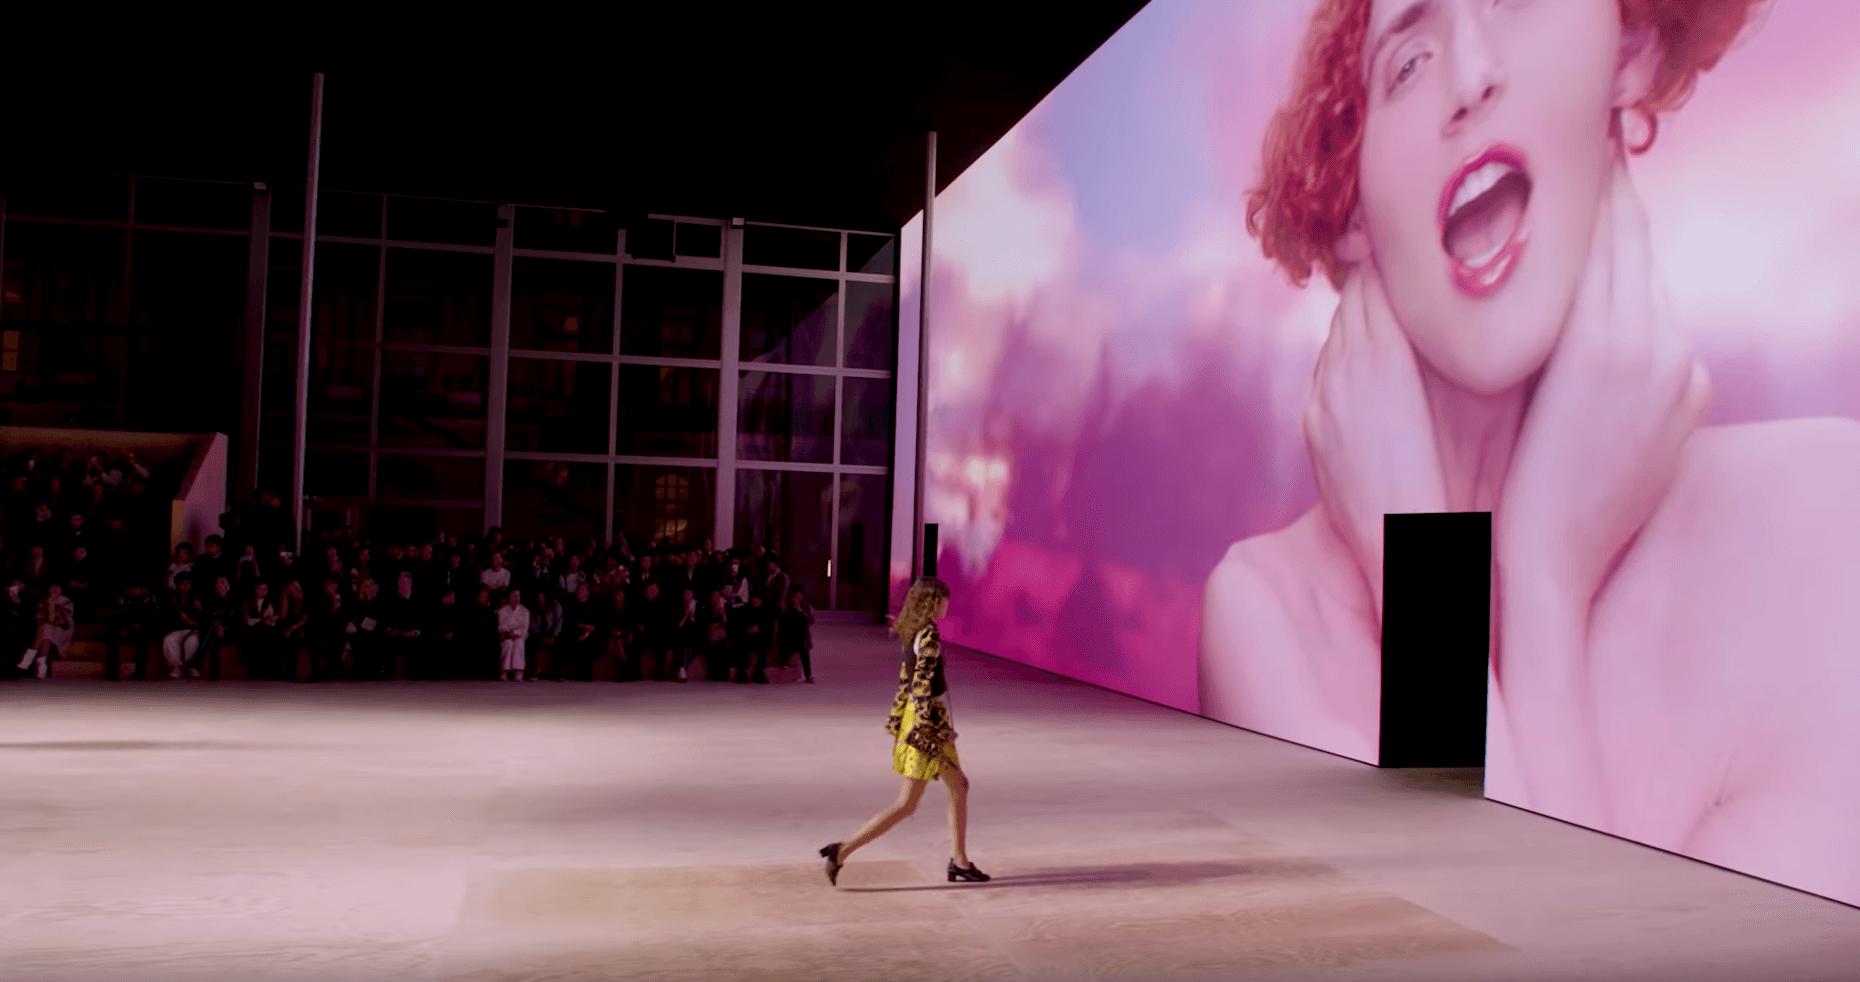 Louis Vuitton Womenswear Spring Summer 2020